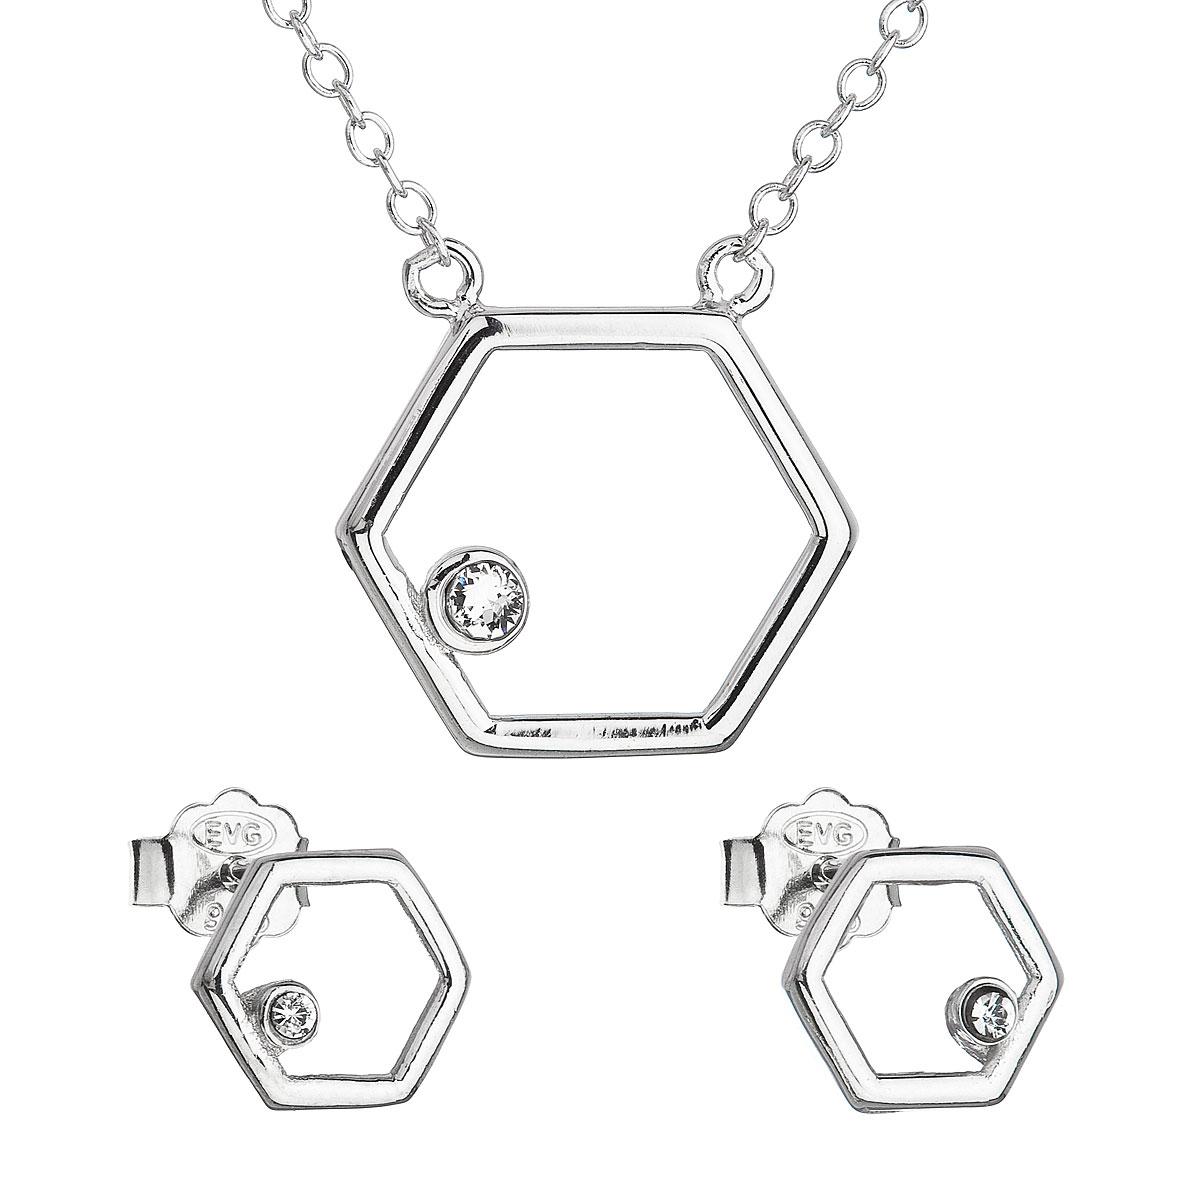 Sada šperků s krystaly Swarovski náušnice a náhrdelník bílý hexagon 39166.1